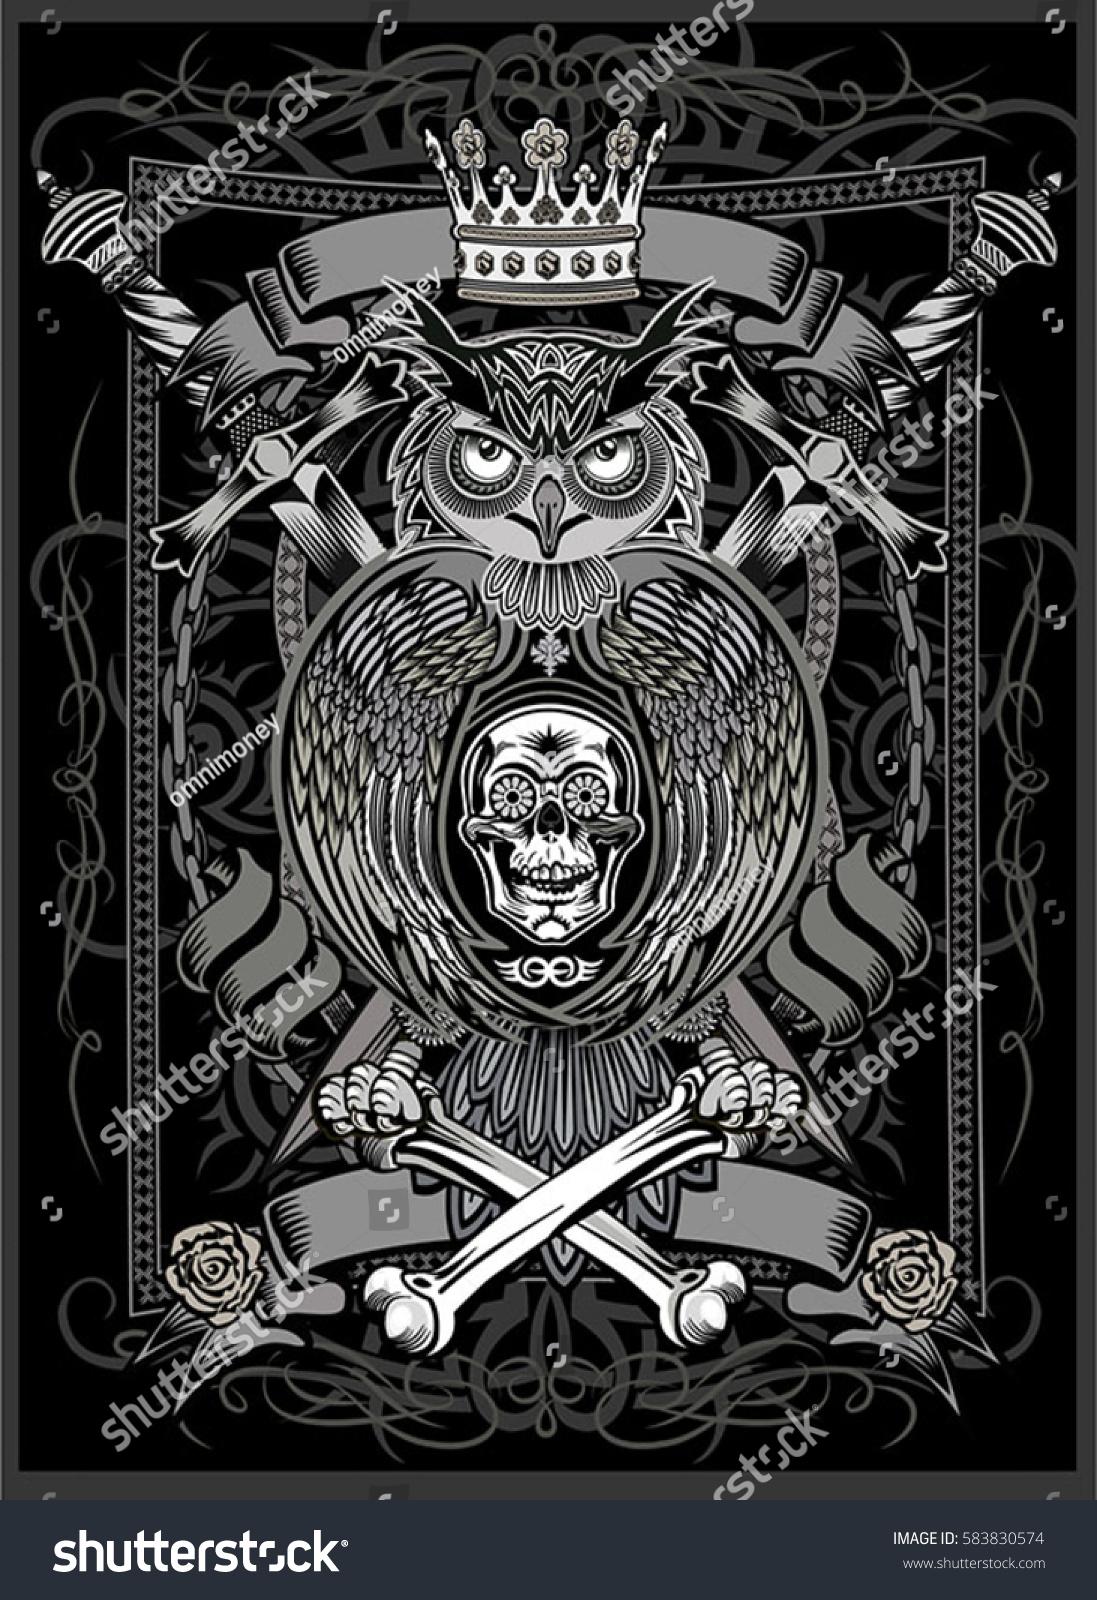 d7f7d22b7 Tattoo Owl Human Skull Rose Stock Vector (Royalty Free) 583830574